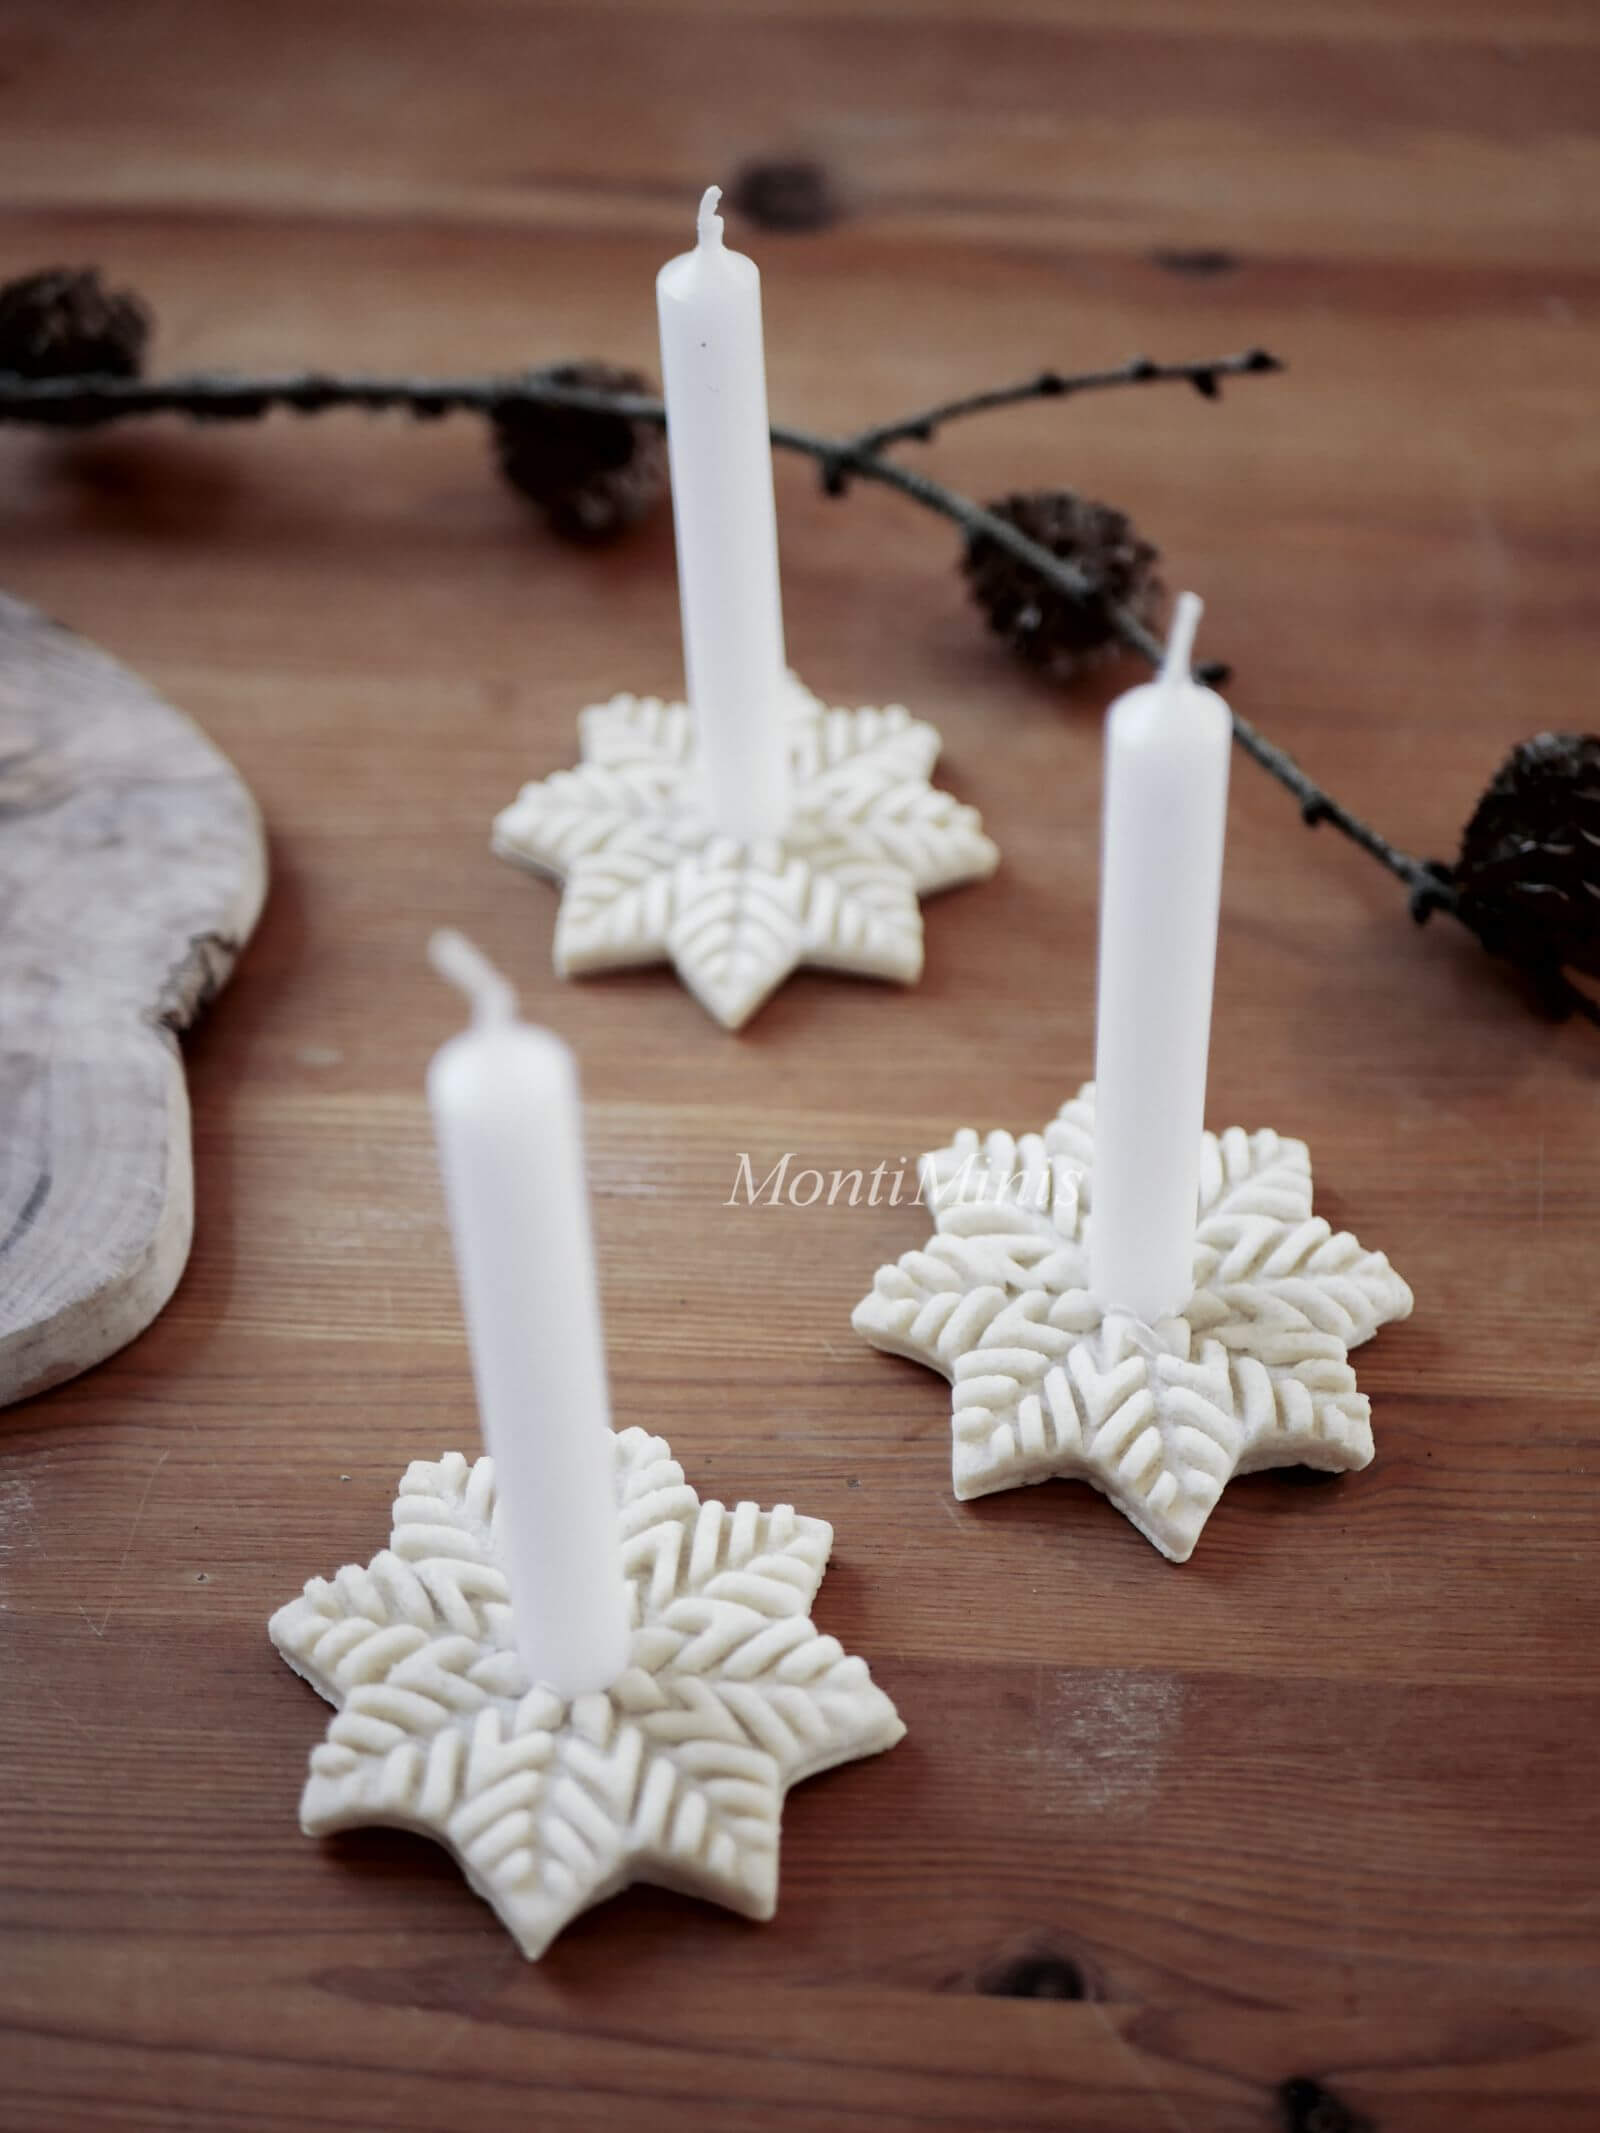 Wunschlist, Licht der Hoffnung, Wunschkerze, Kerzen DIY, Geschenktipp, Winterbastelei, Bastelidee, MontiMinis.com